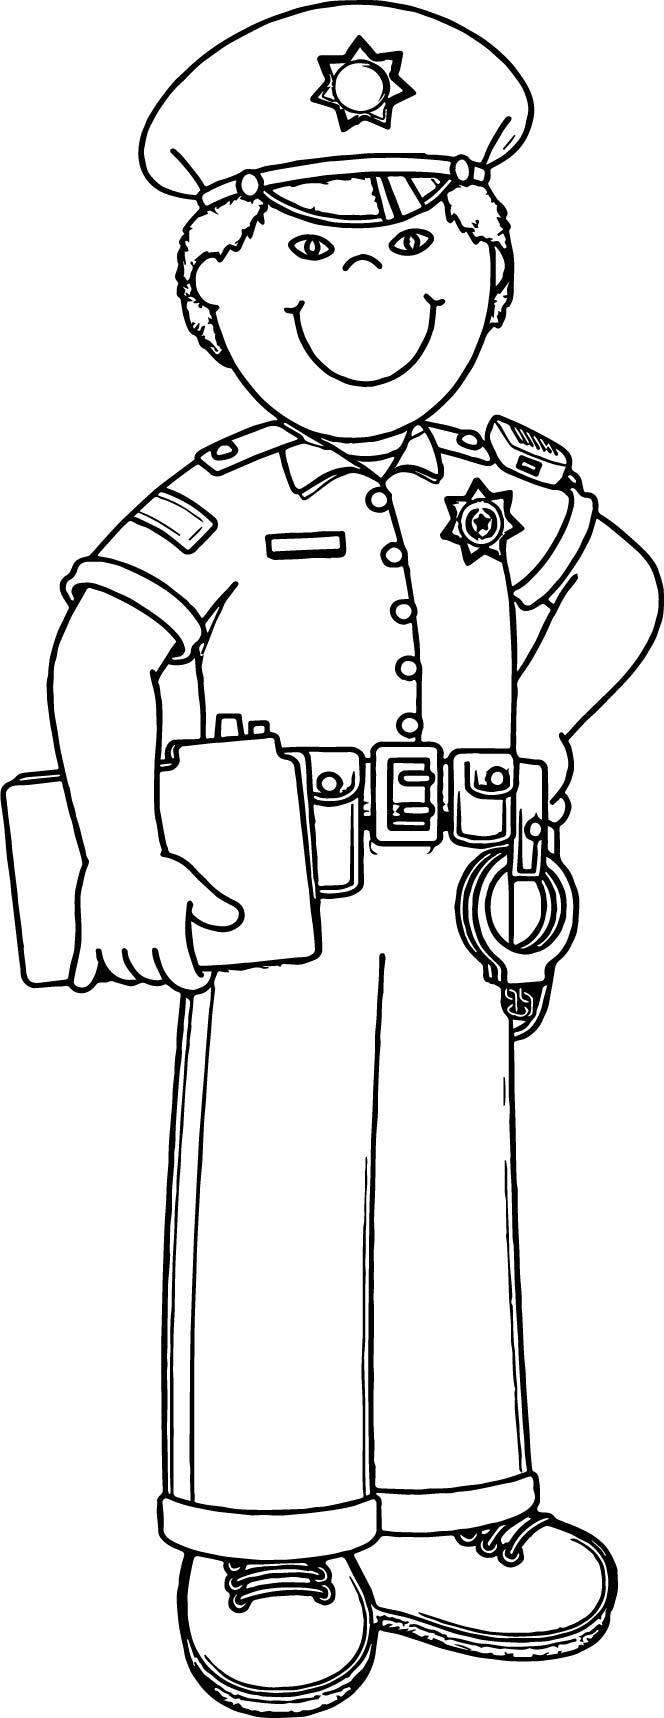 police coloring page free printable policeman coloring pages for kids police page coloring 1 1